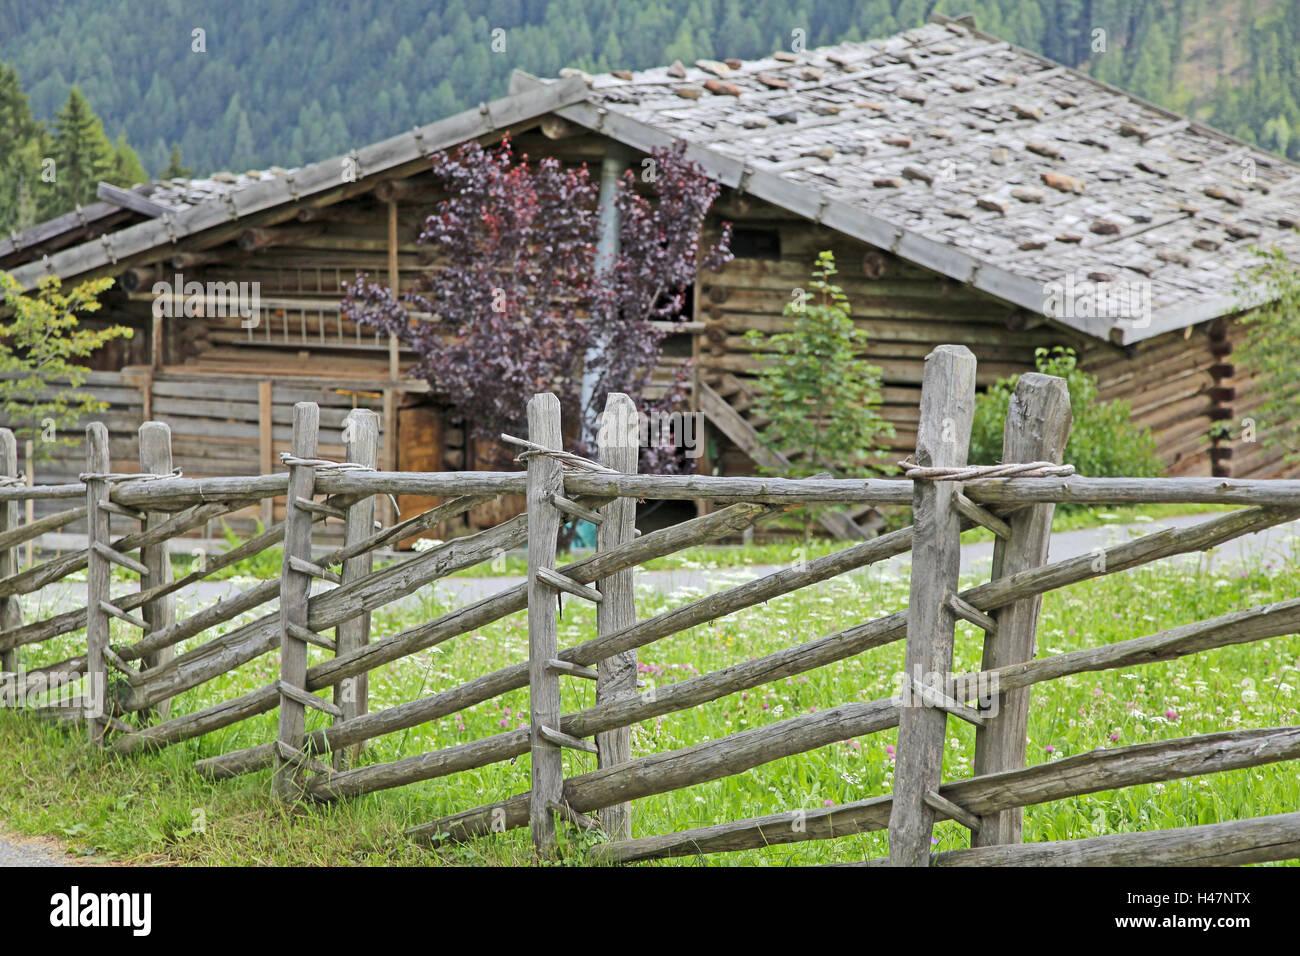 wooden farm fence. Wooden Fence, Mountain Farm, Wooden, Stick, Diagonally, Pole, Typically, Meadow, Pasture, Pawn House, Pawn, Old, Farm Fence